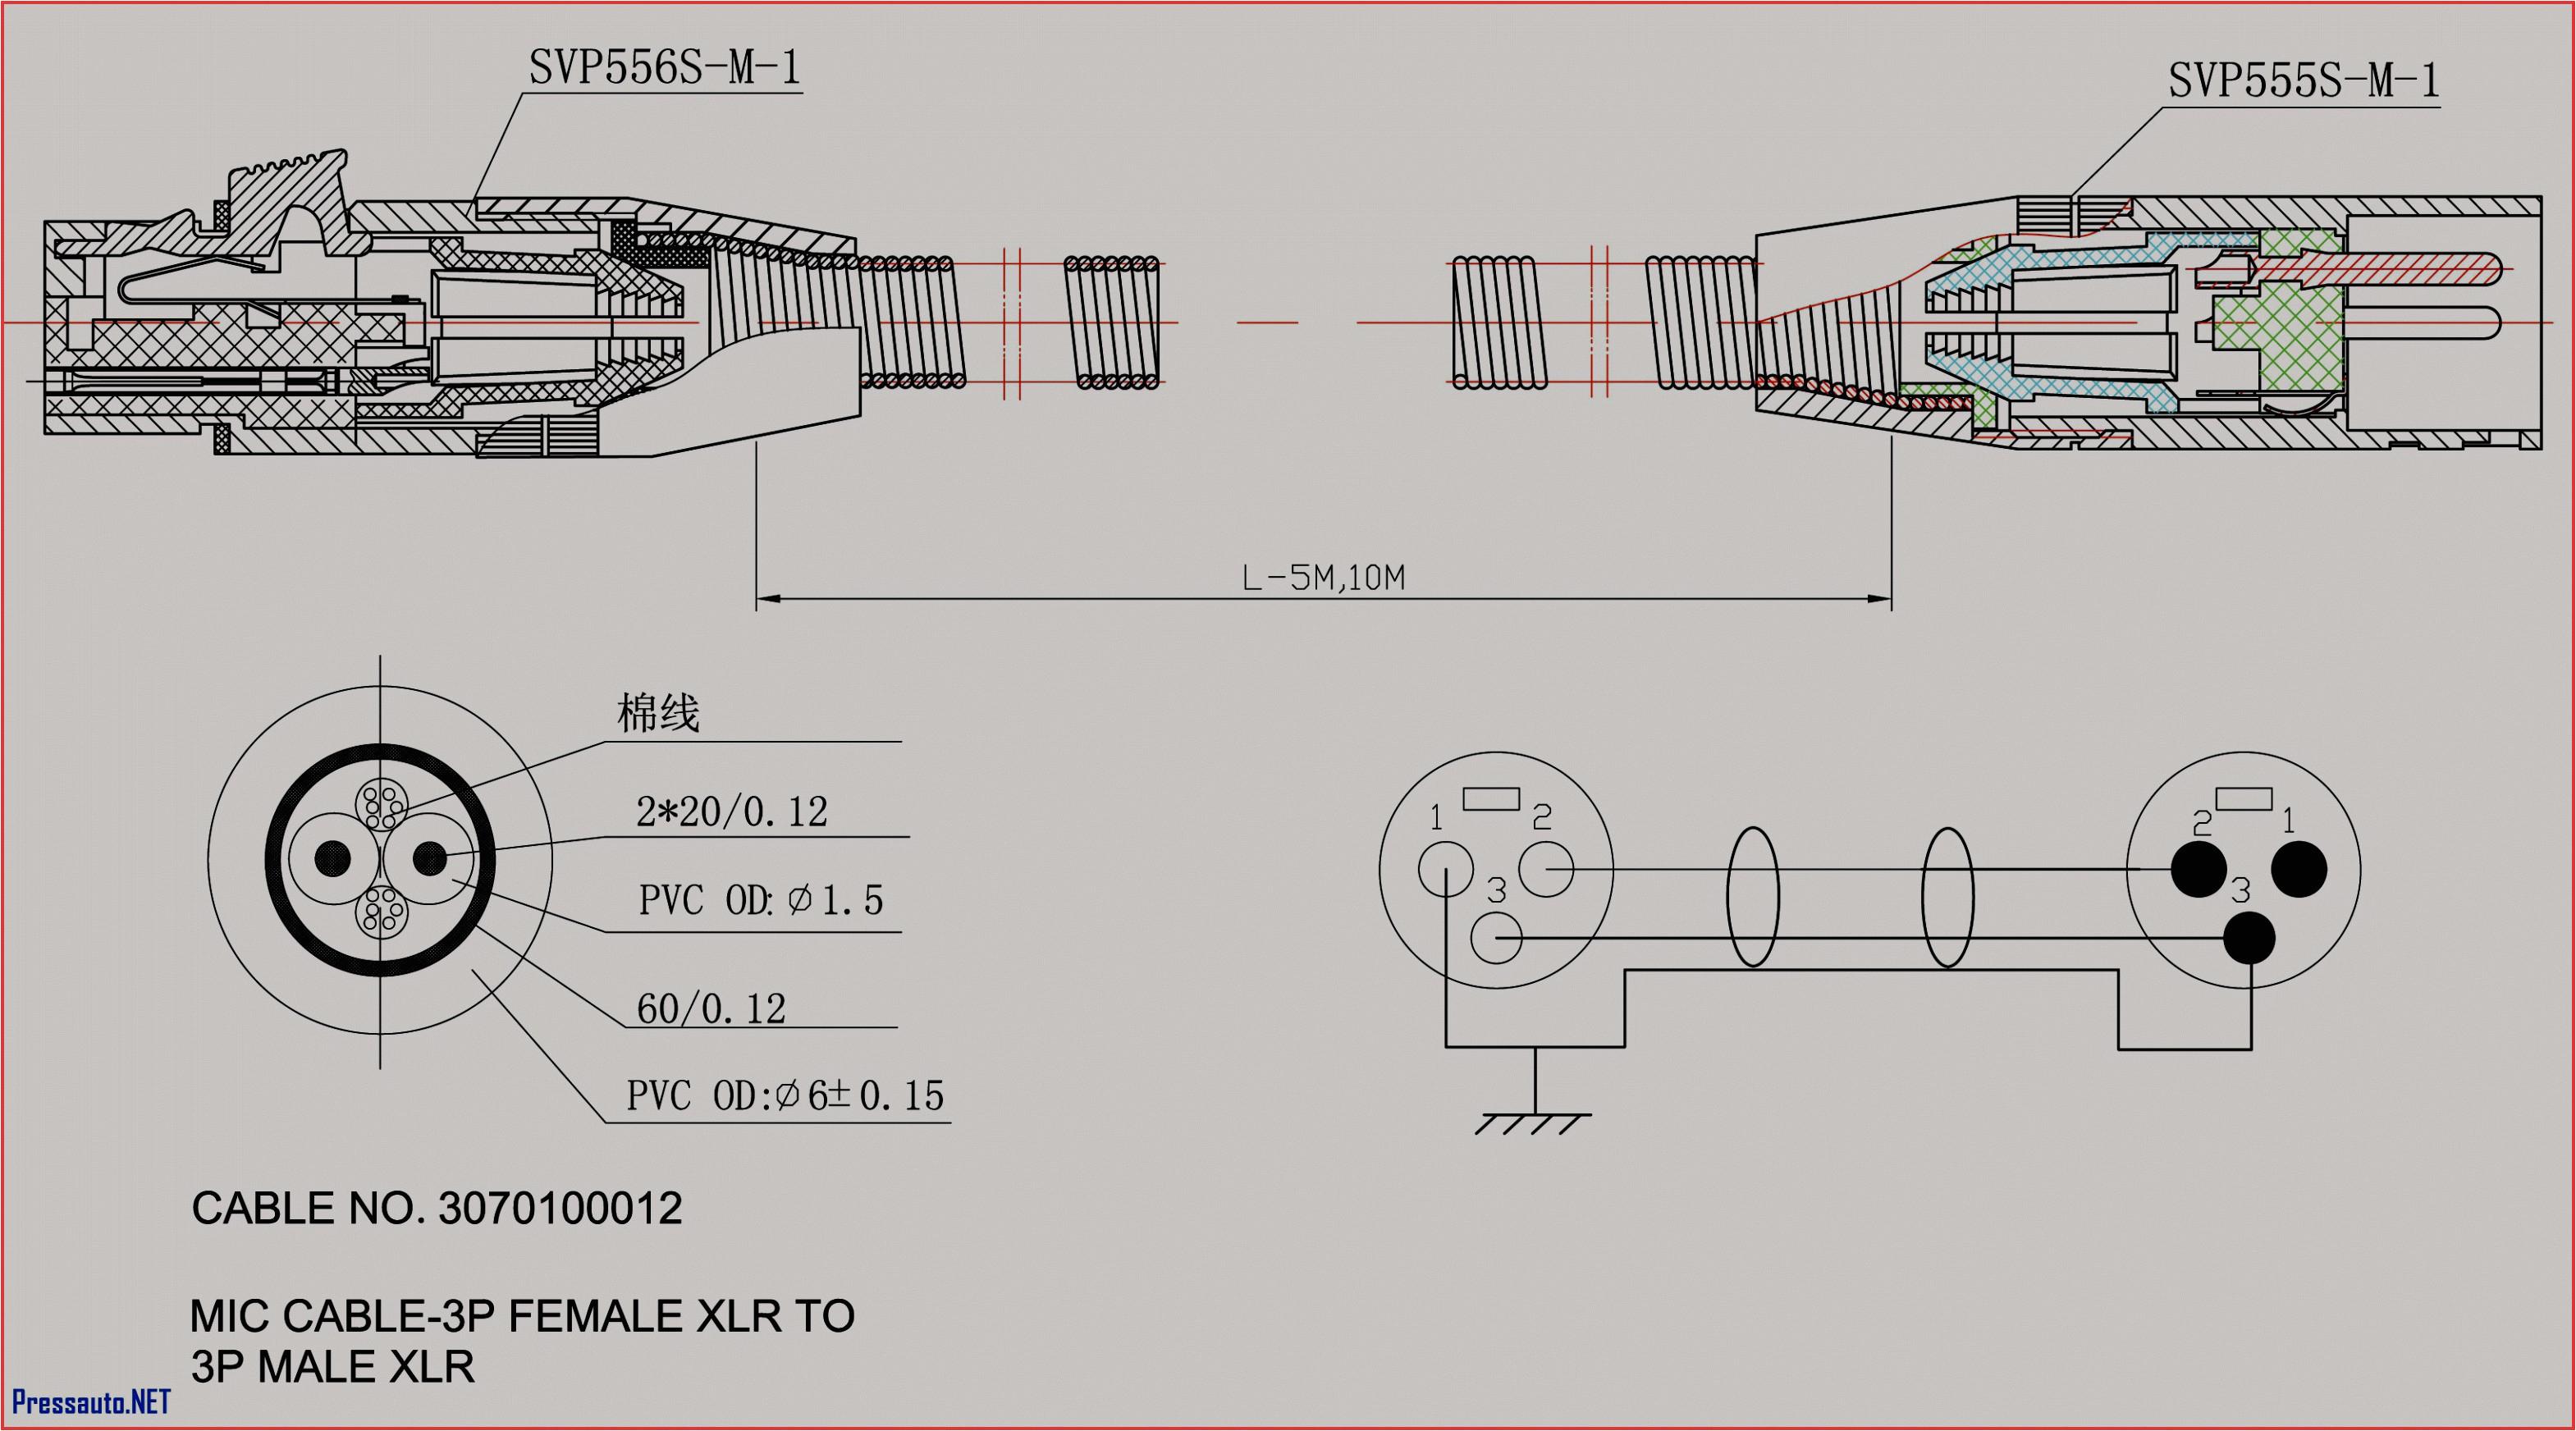 wiring alternator diagram download ford trucks wiring diagrams audi a4 alternator wiring diagram fresh bw od